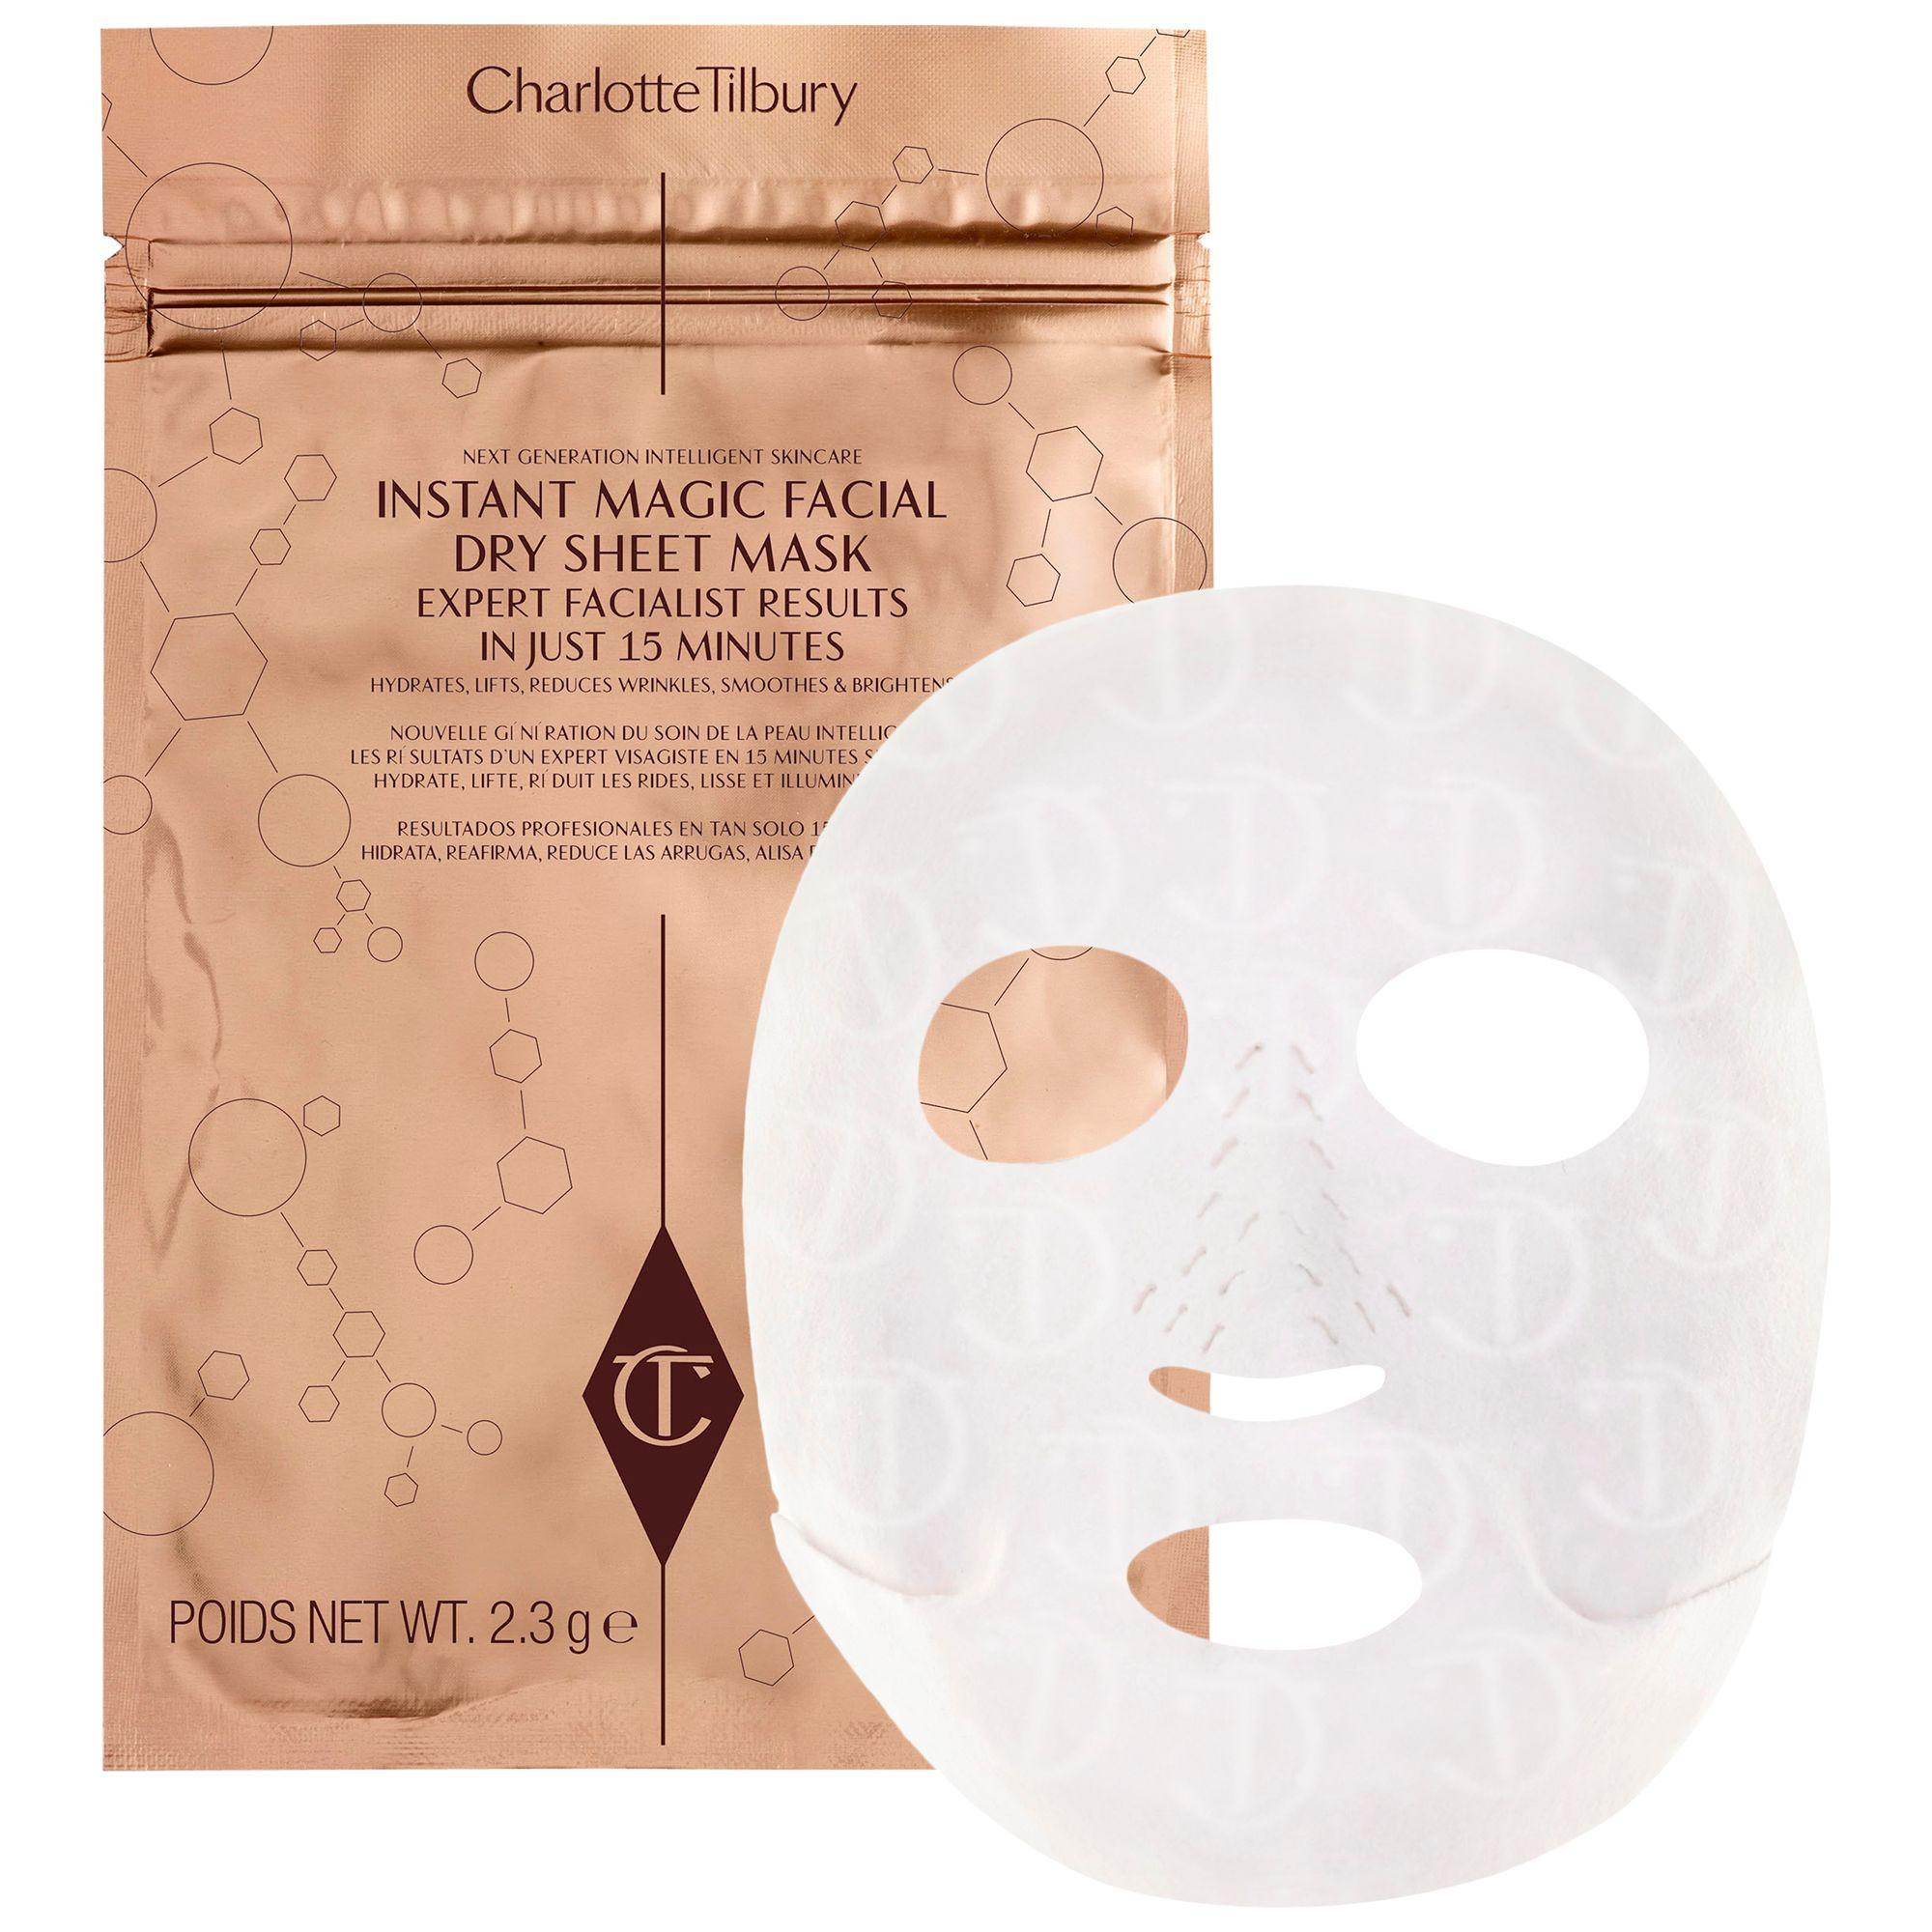 Charlotte Tilbury Charlotte Tilbury Instant Magic Facial Dry Sheet Mask, x 1